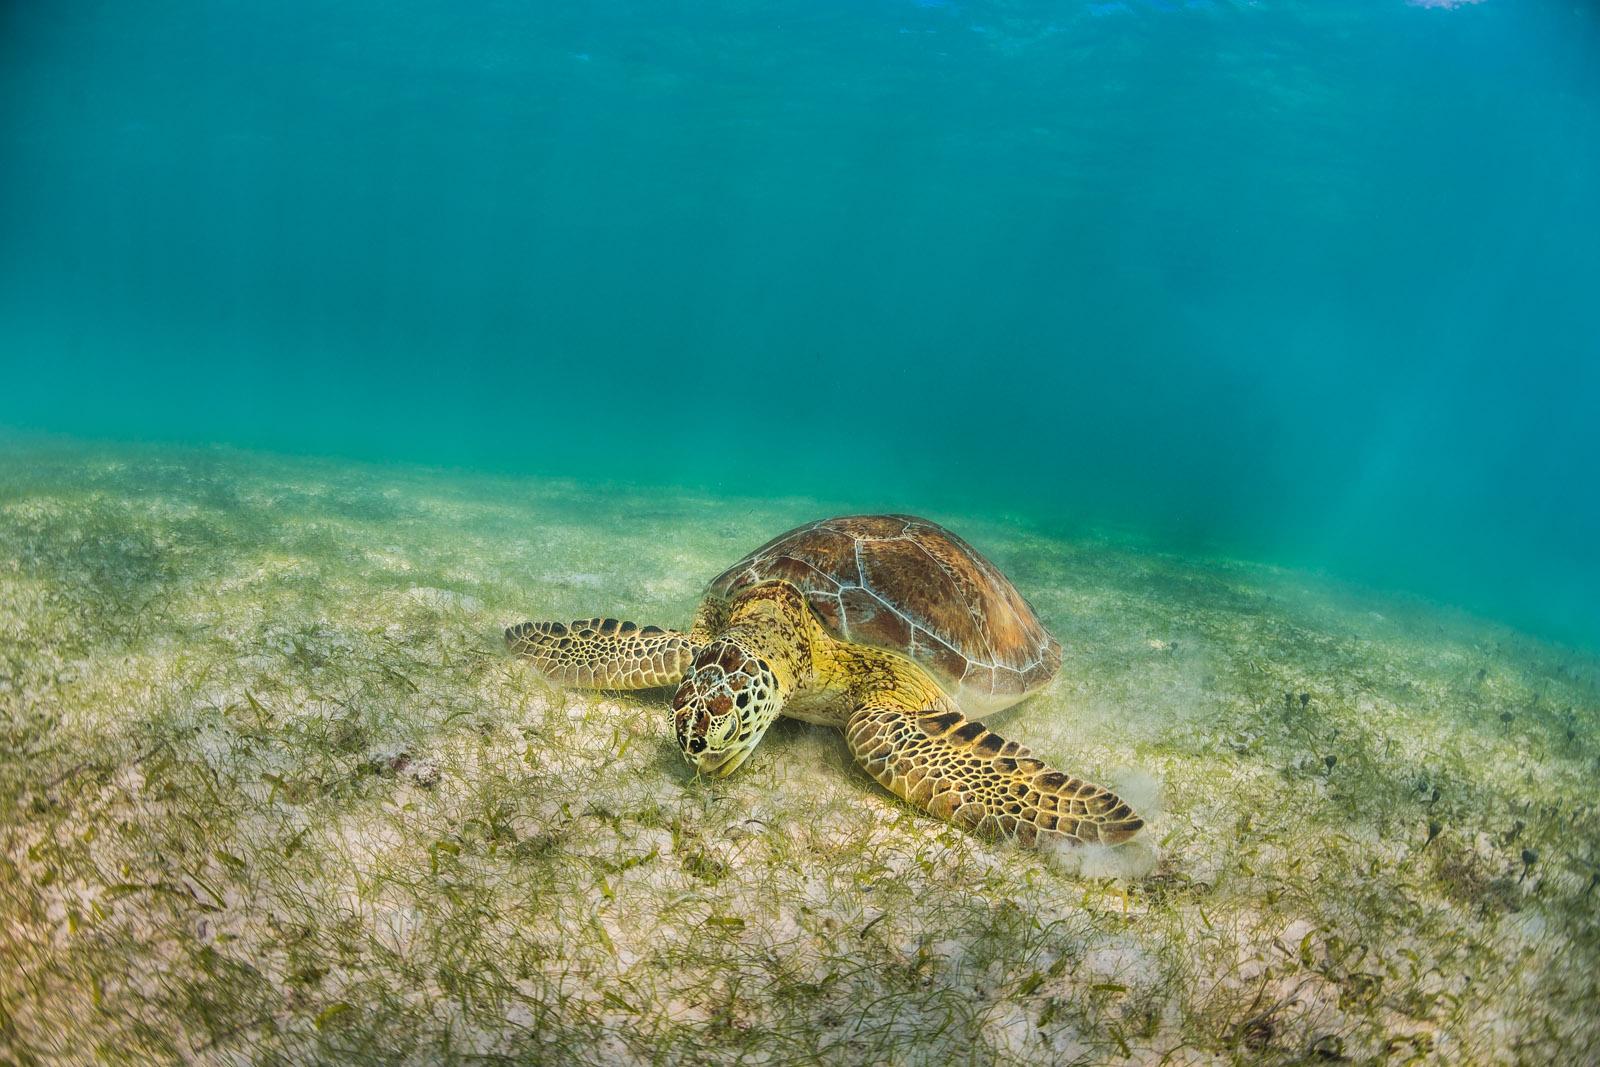 tortuga, seaturtle, havssköldpadda, underwater, underwaterphotographer, underwaterphotography, underwaterphoto, uvfoto, undervattensfoto, undervattensfotograf, caribbean, karibien, mexico, mexiko, akumel, tulum, anhede, nomnomnom, ocean, water, endangered, tortoise, chelonioidea, eating, eat